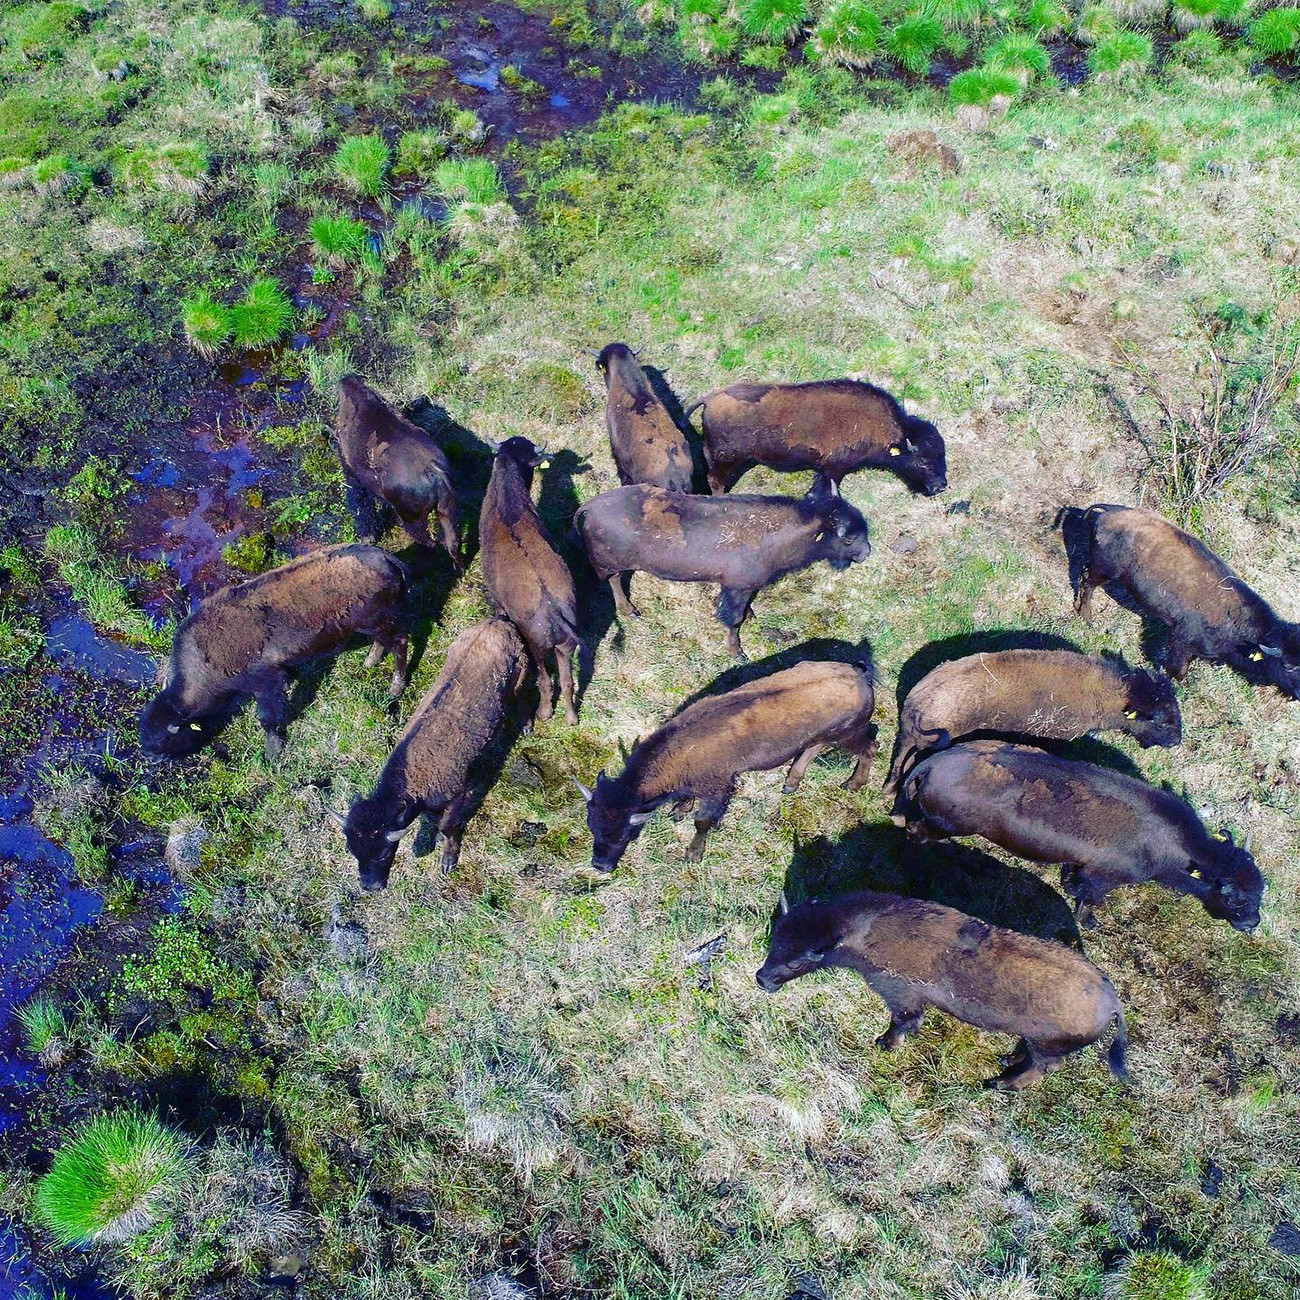 Pada 2019, Taman Pleistosen menyambut kerbau-kerbau stepa Amerika Utara yang kini telah beradaptasi dengan iklim setempat.